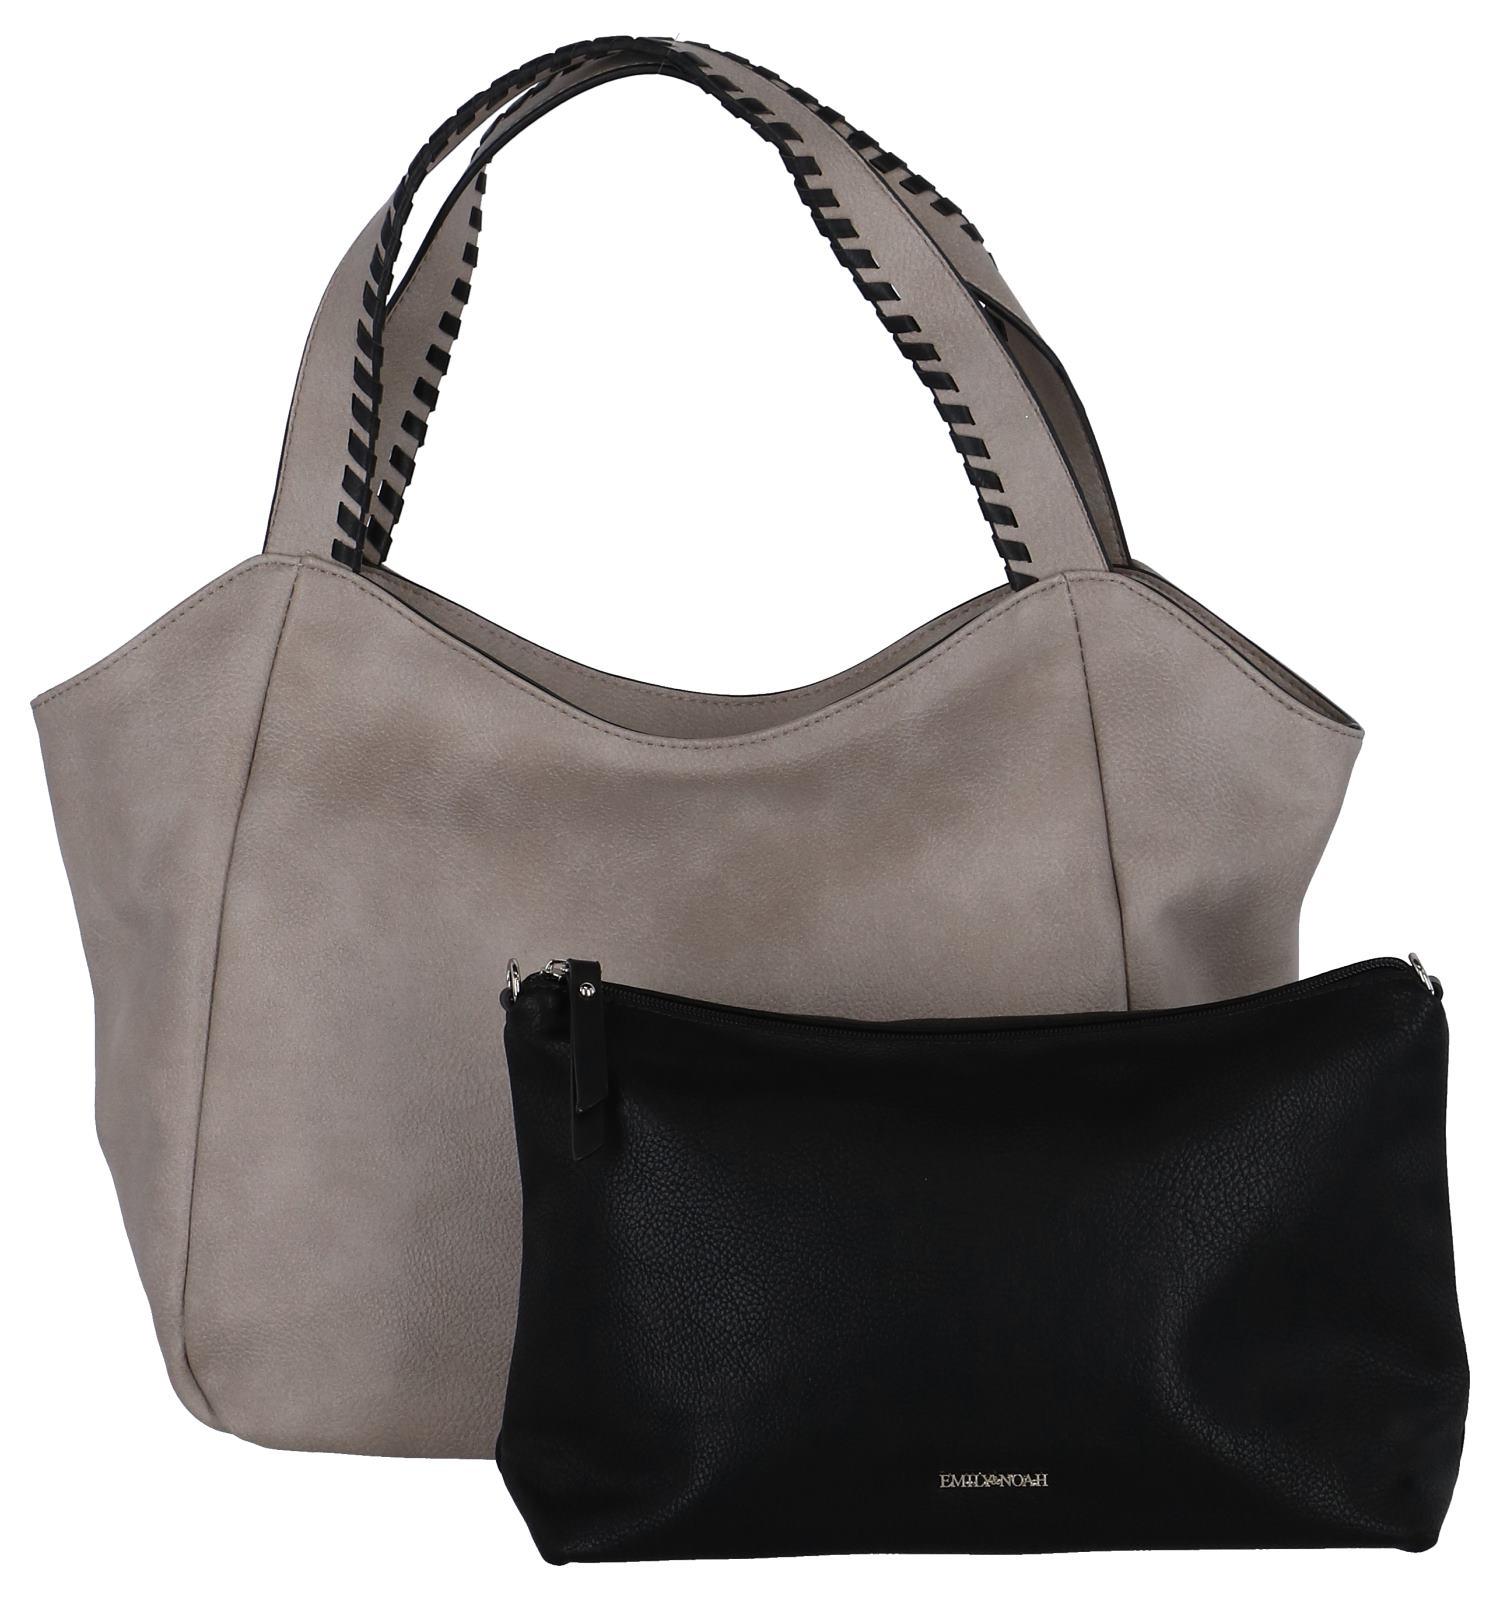 Taupe Bag in Bag Schoudertas Emily & Noah | SCHOENENTORFS.NL | Gratis verzend en retour